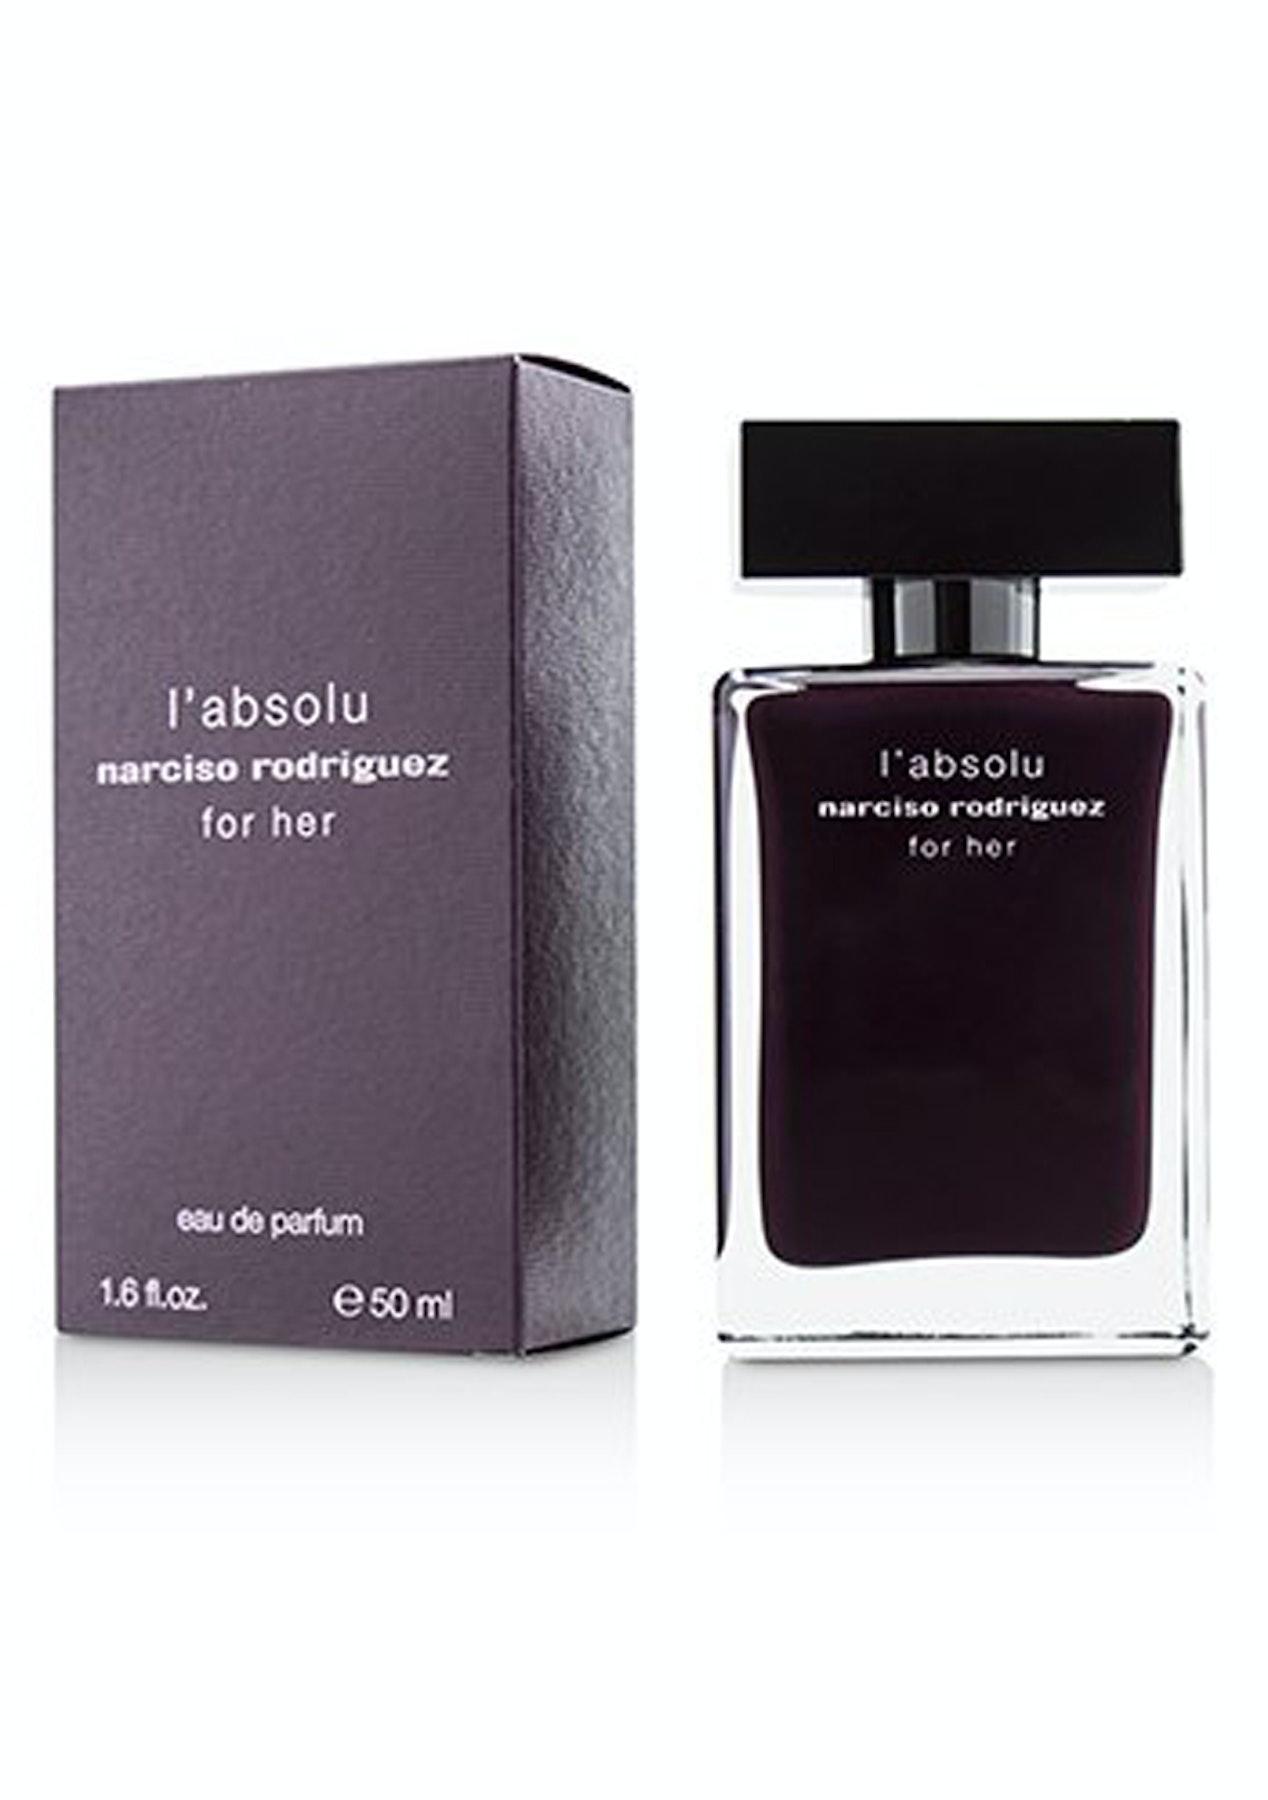 Narciso Rodriguez For Her Labsolu Eau De Parfum 50ml Designer